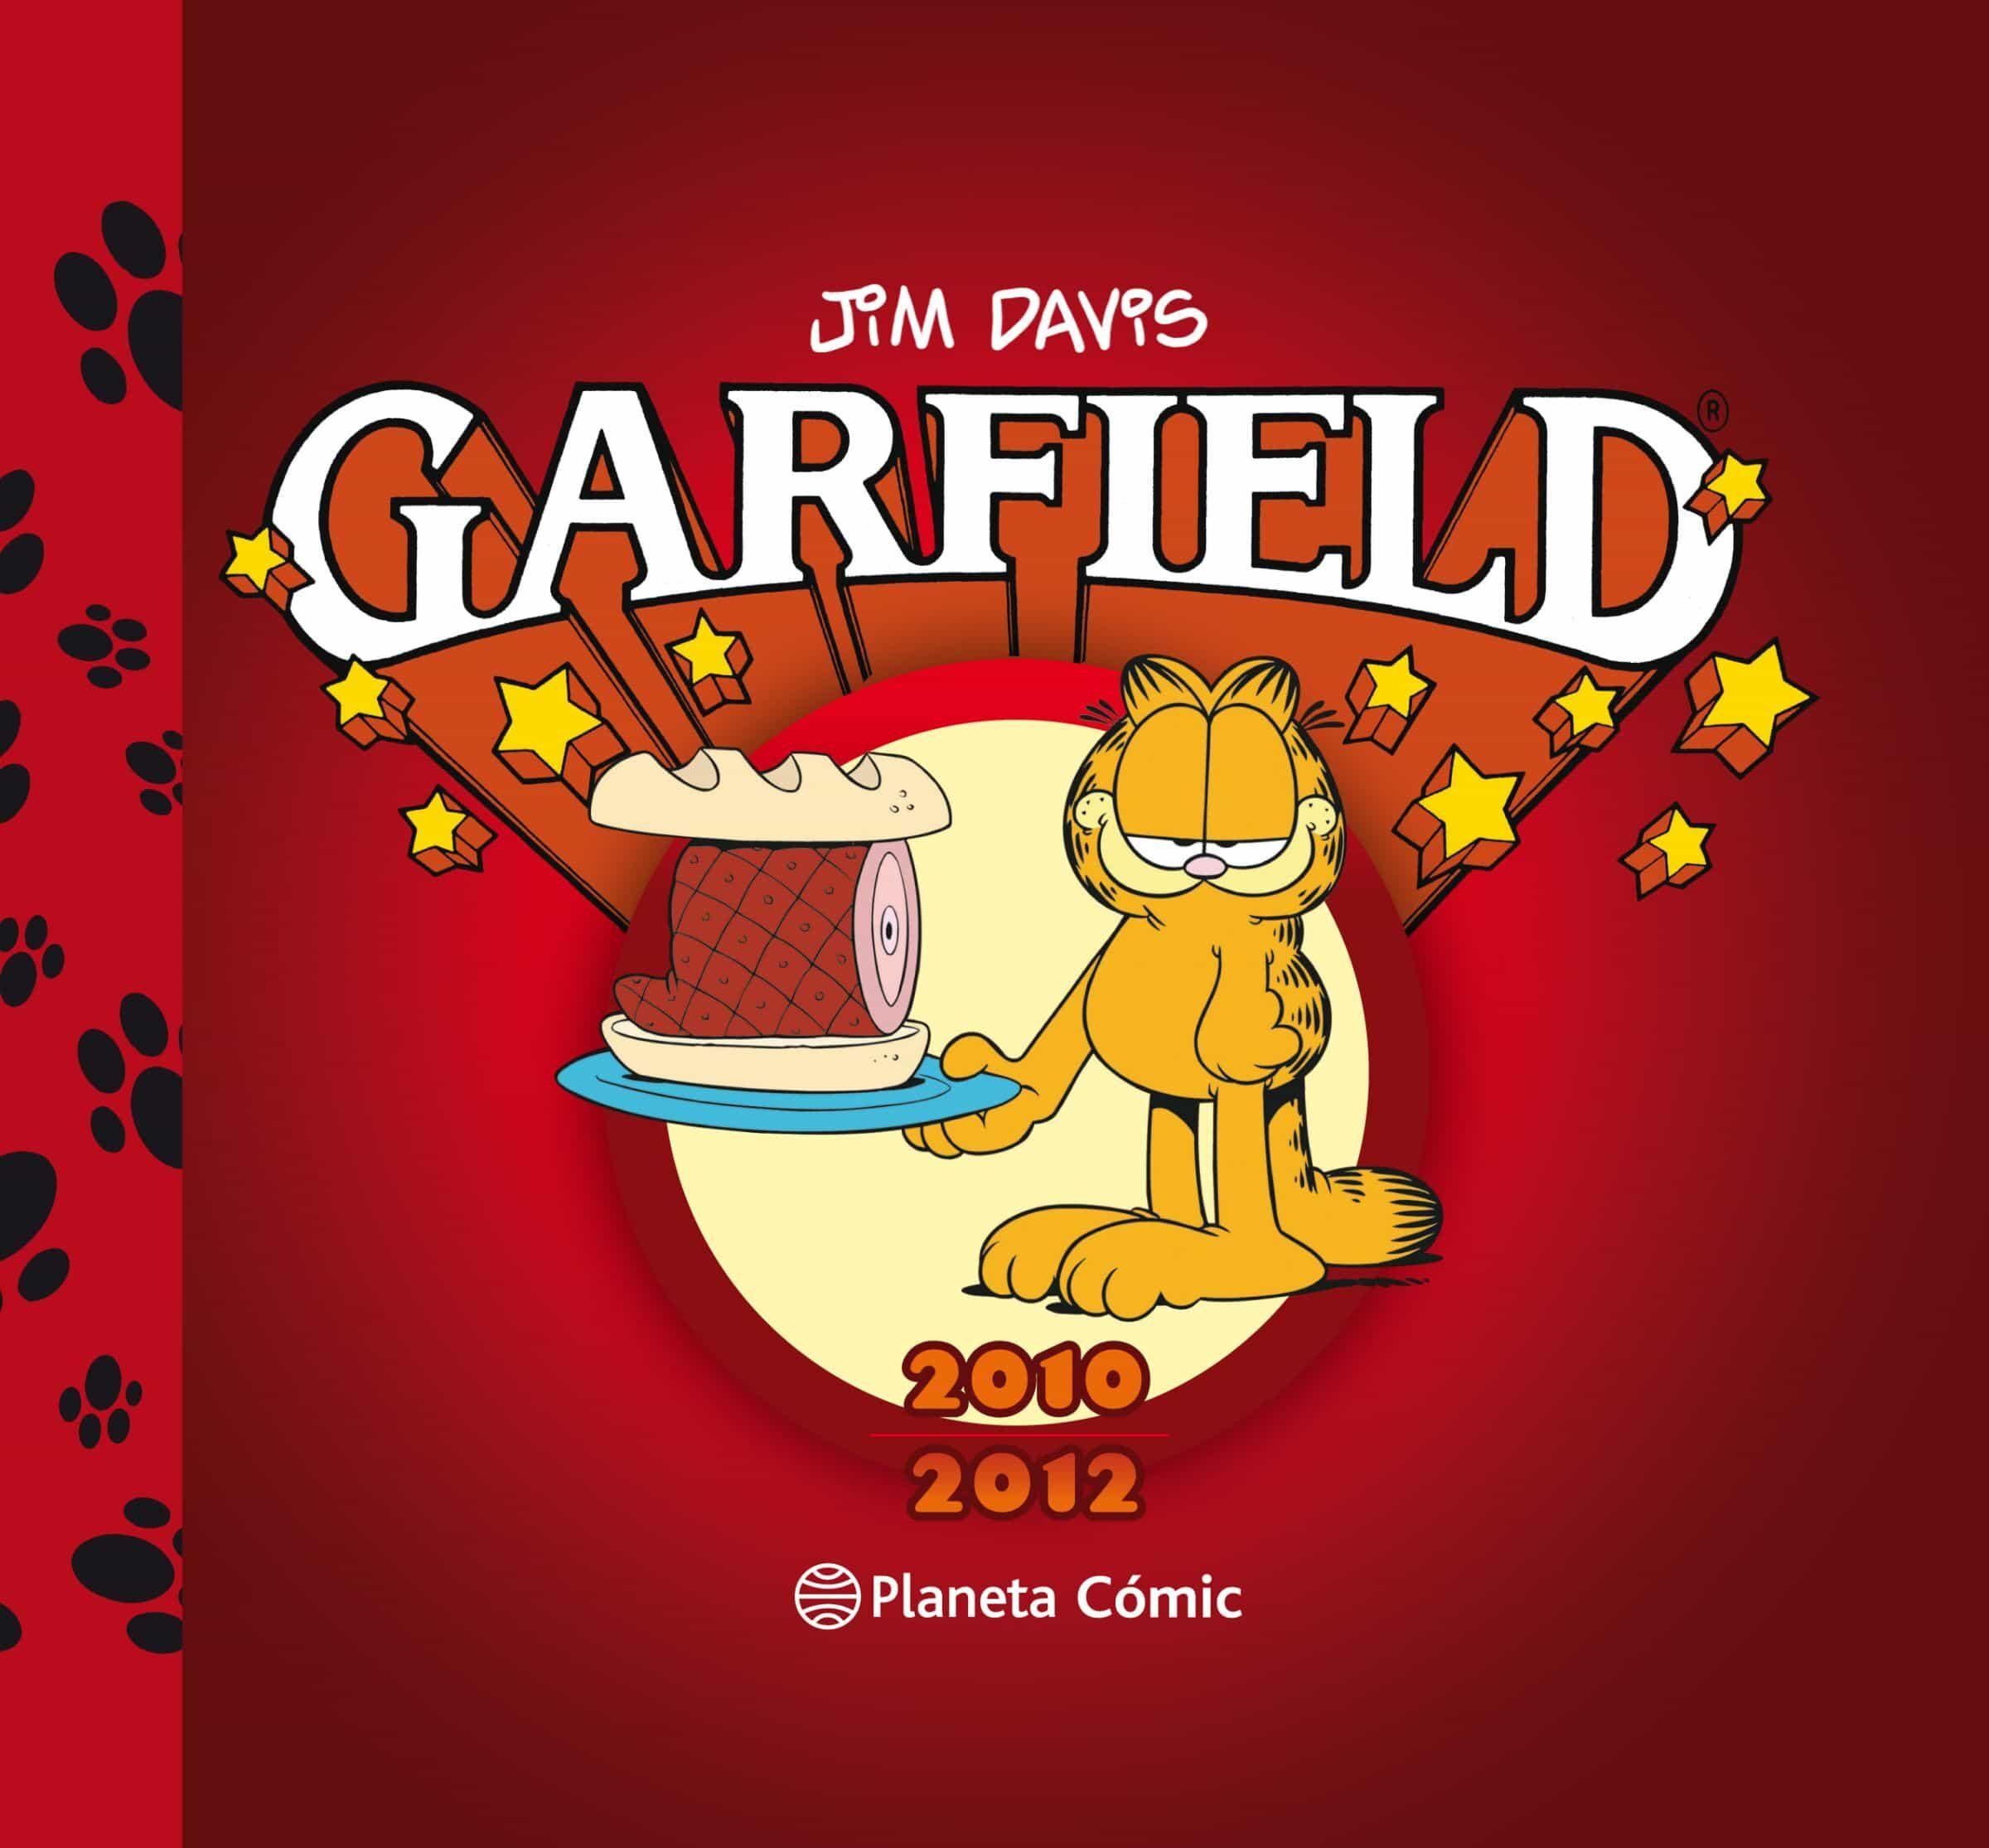 garfield 17-jim davis-9788468477985